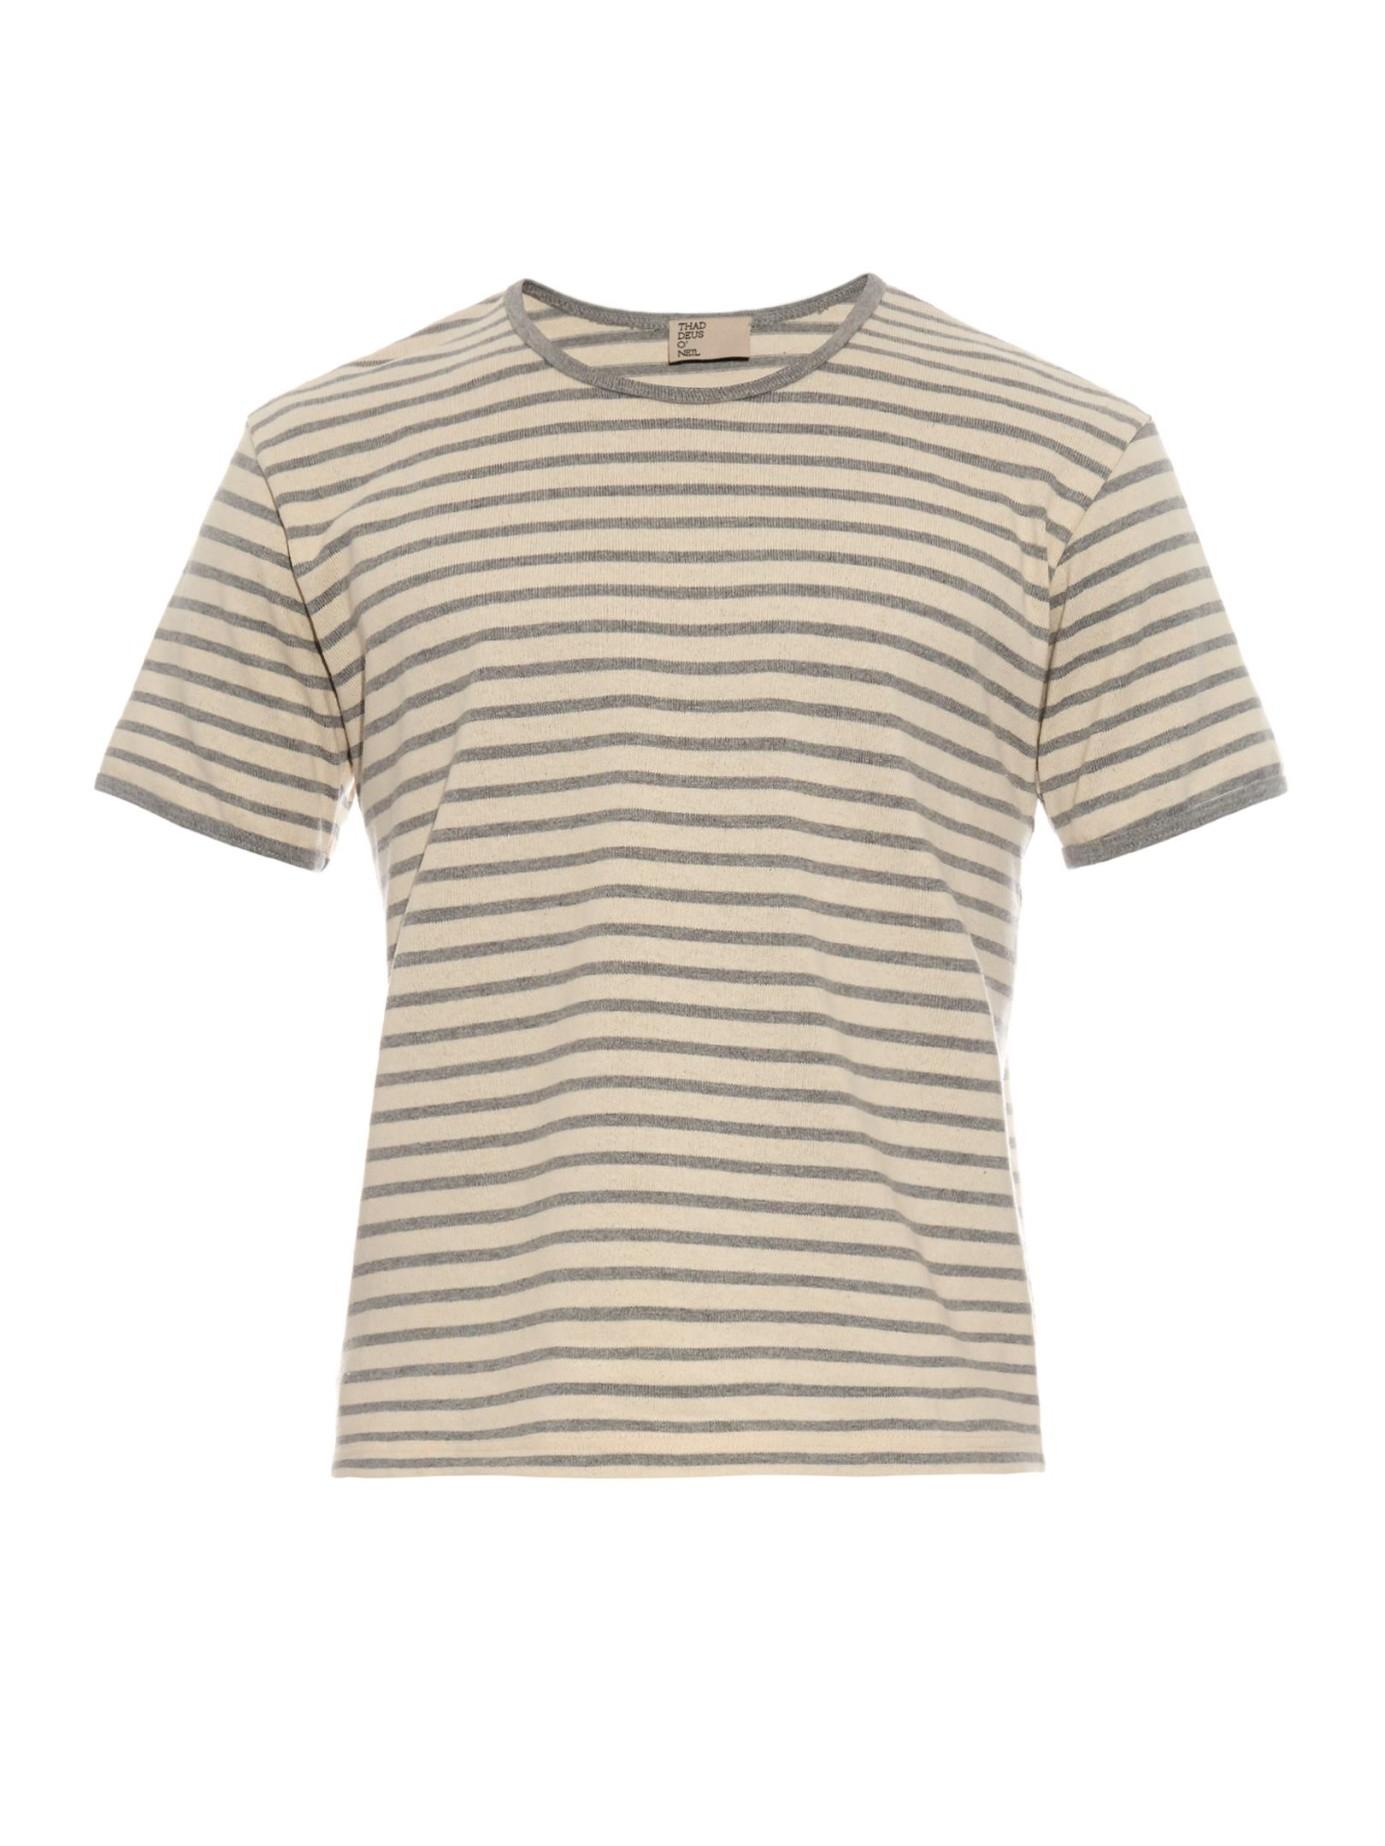 Thaddeus o 39 neil striped cotton t shirt in gray for men lyst Grey striped t shirt